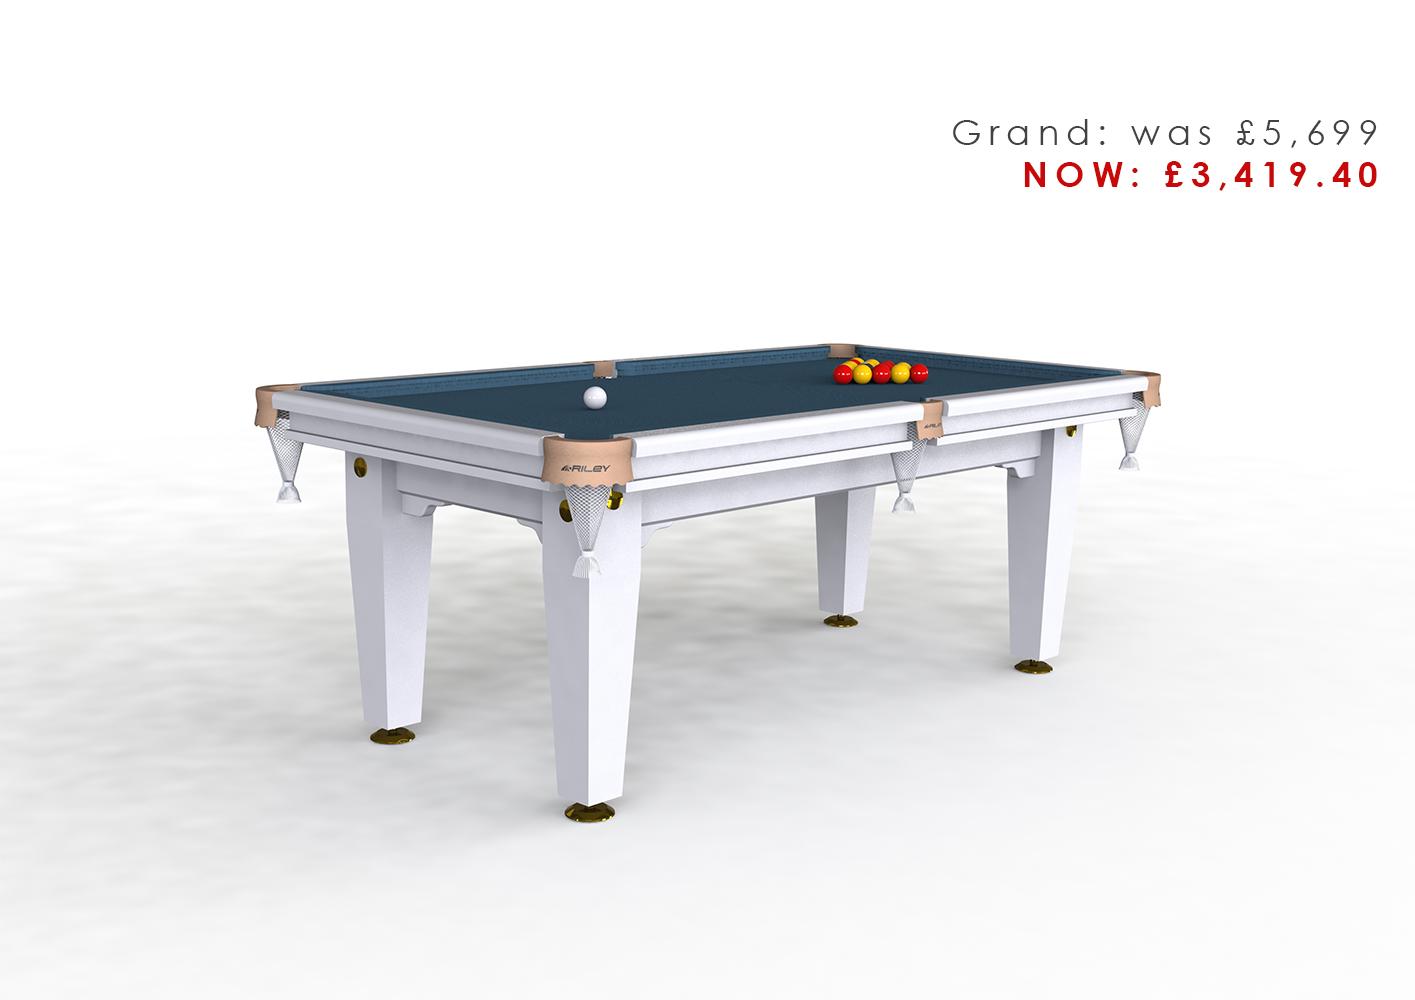 Riley Grand 7ft Pool Diner